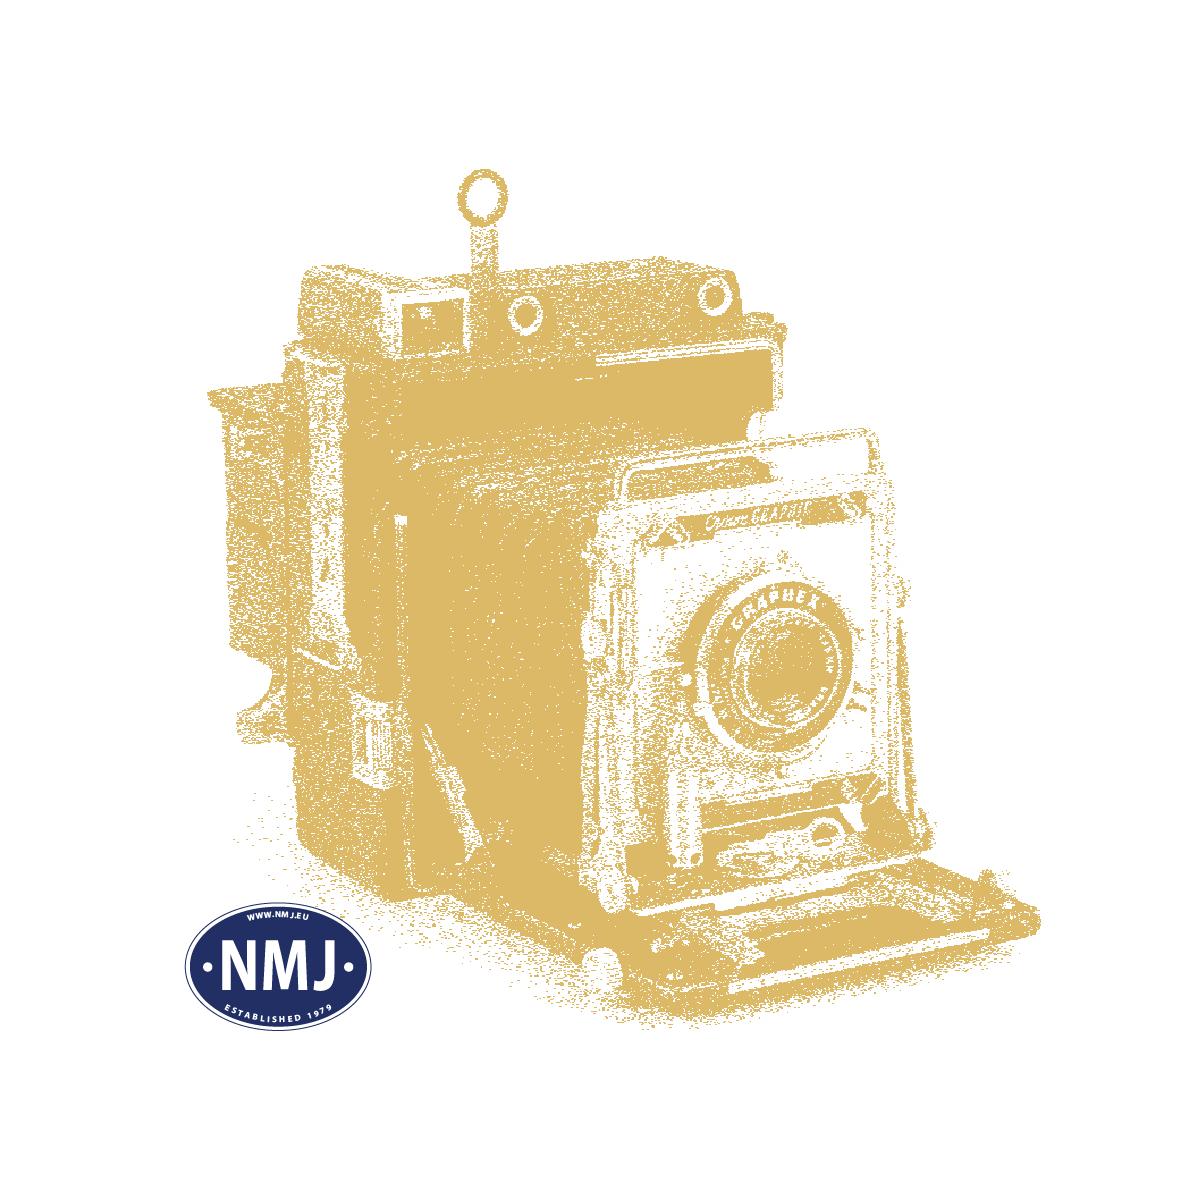 NMJT80.101AC - NMJ Topline NSB EL17.2221, AC